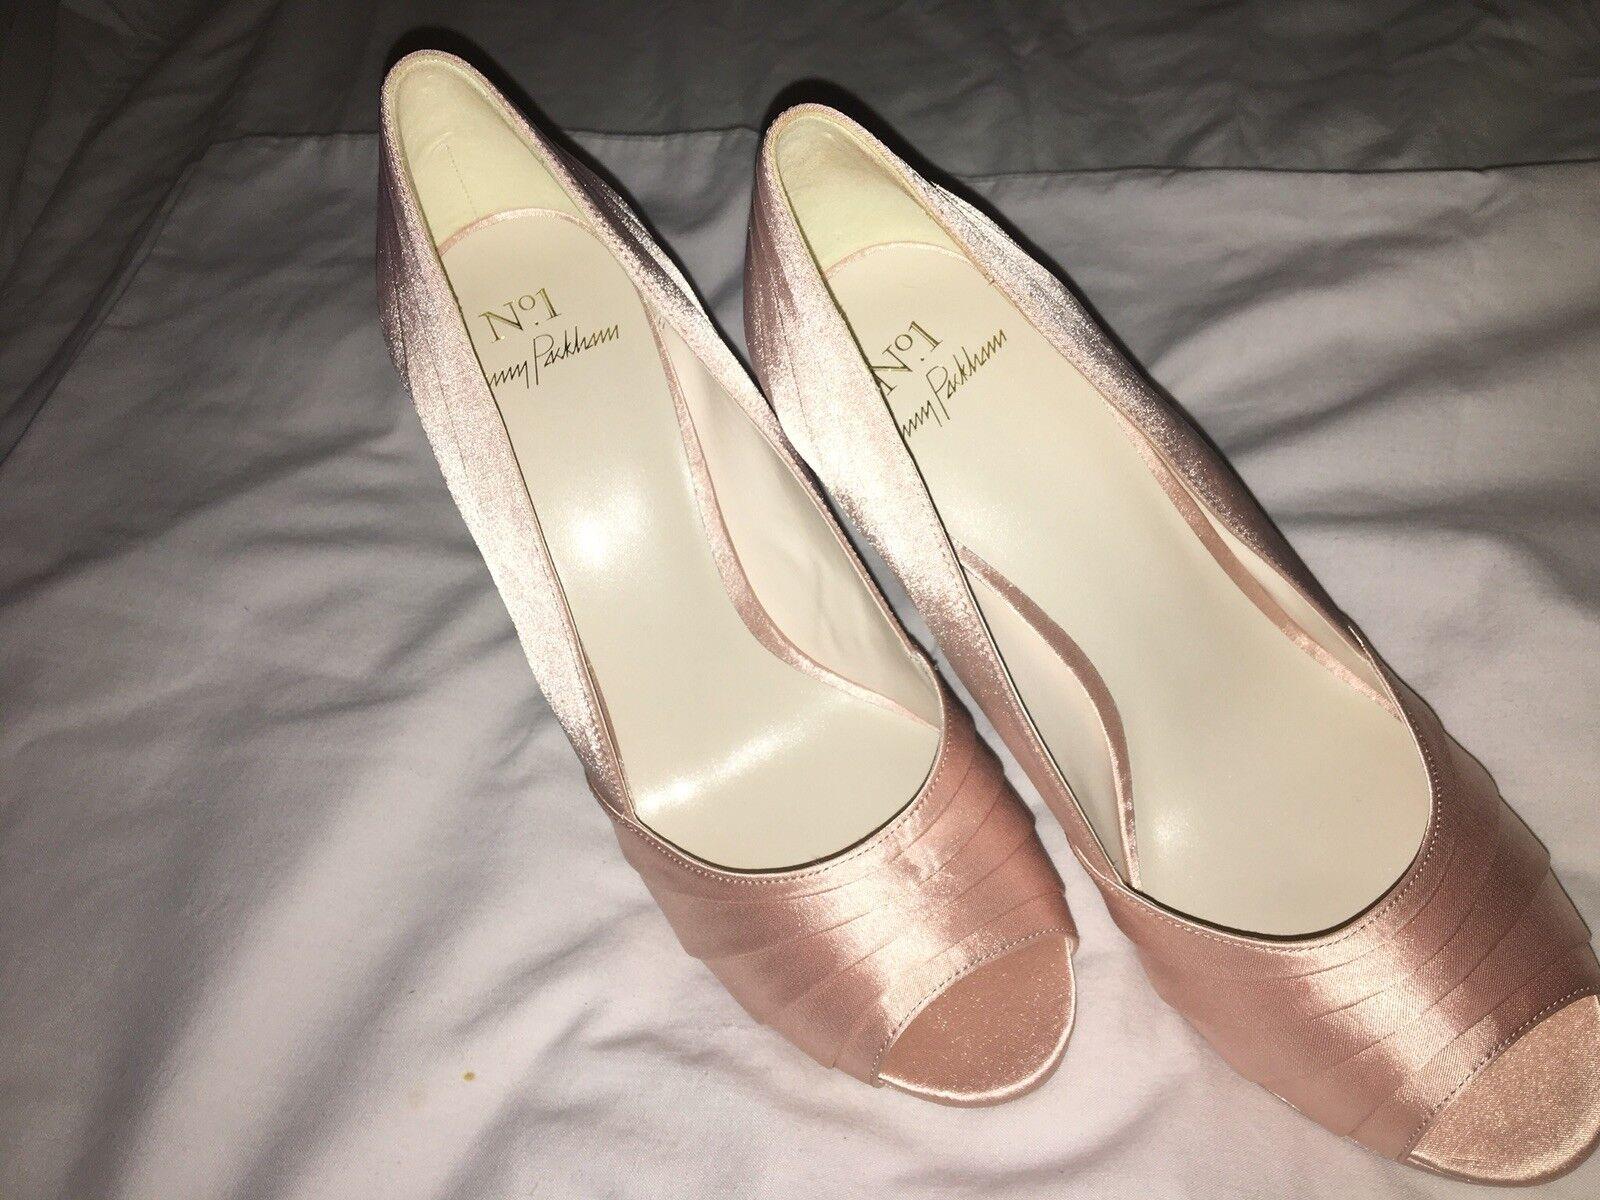 No. 1 Jenny Packham Light pink Satin 'Pandora' Peep Toe Stiletto size 4- NEW